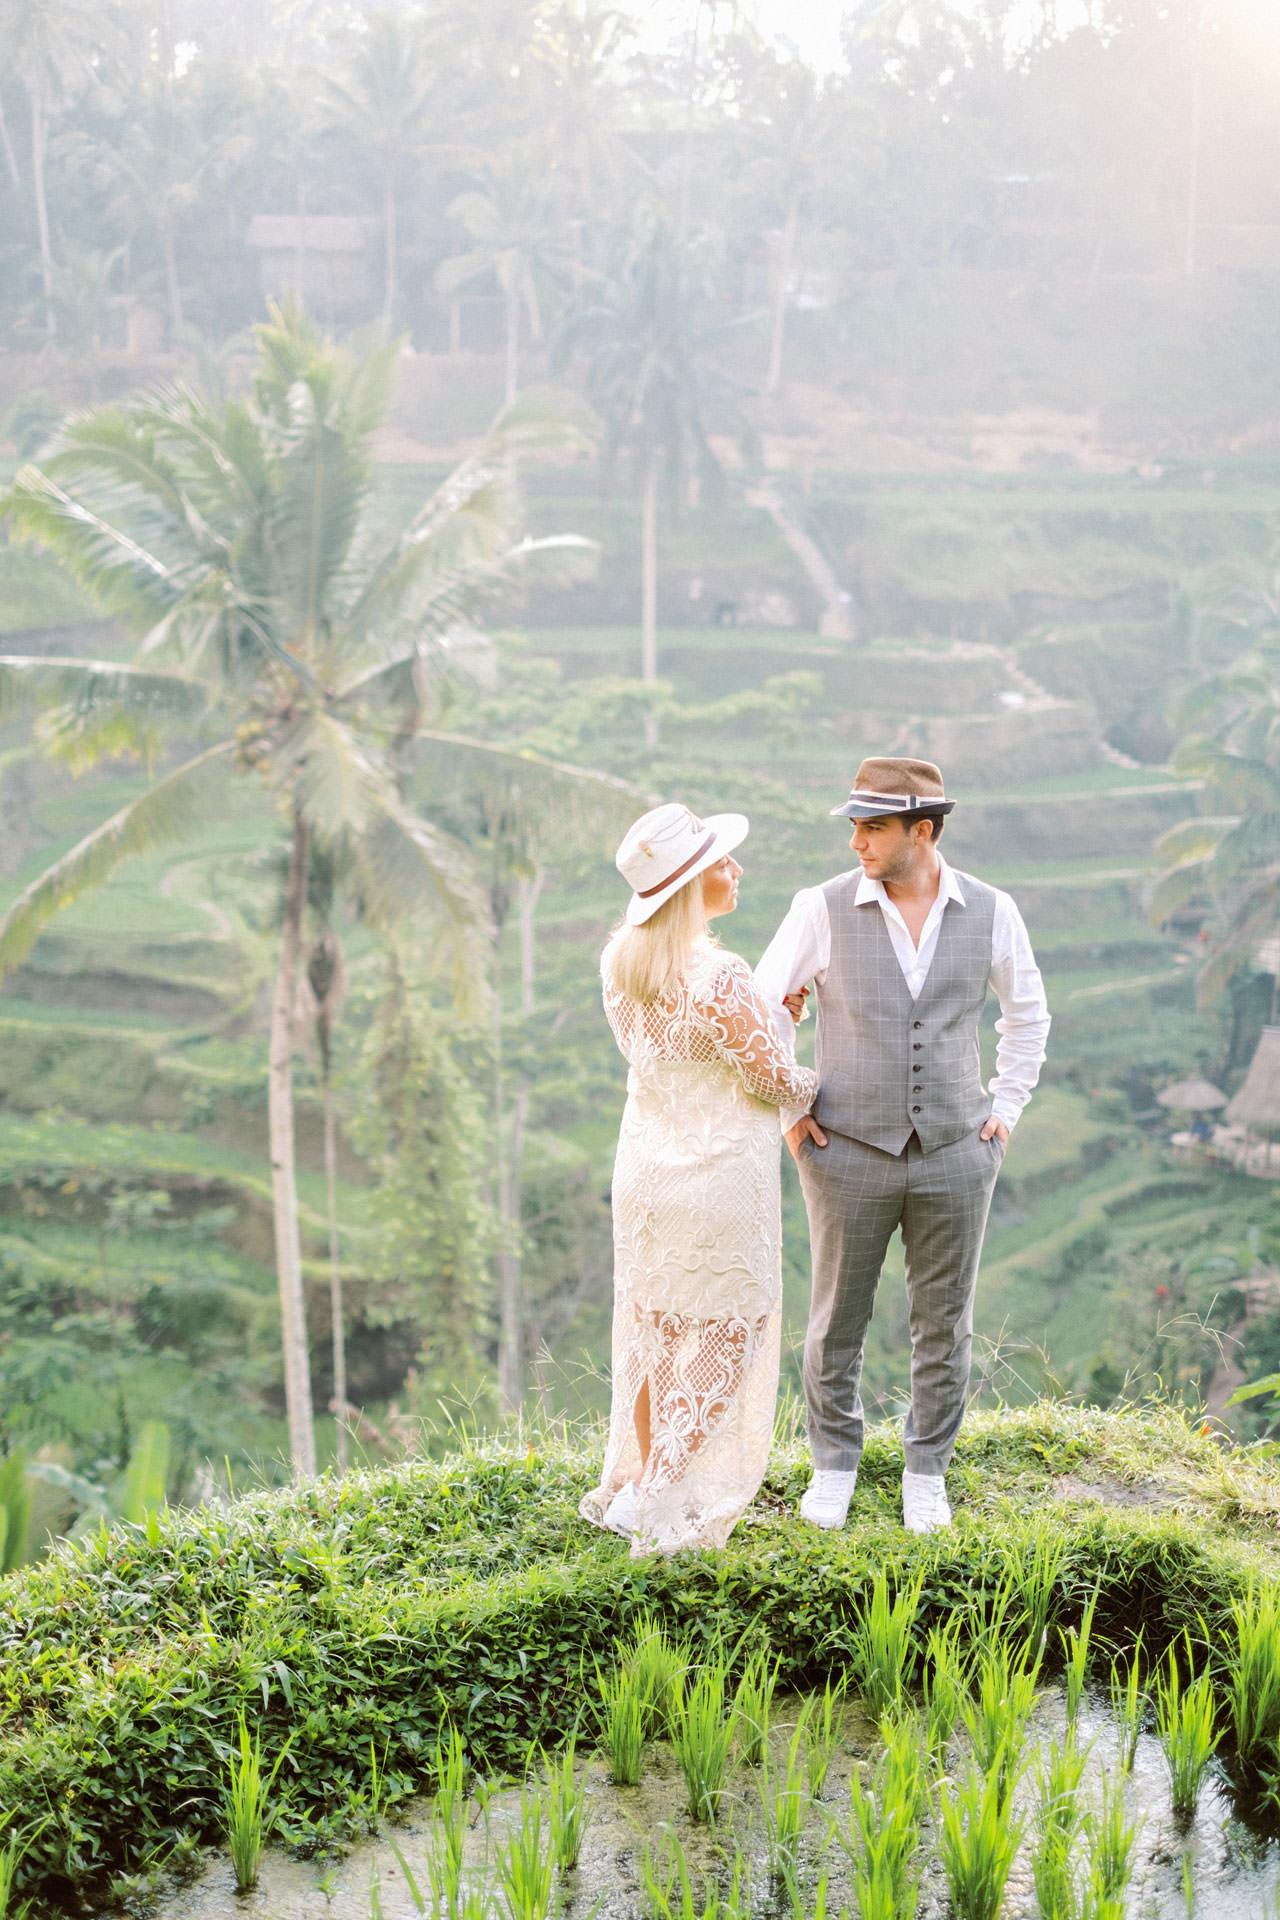 Peaceful Bali Honeymoon Locations 3